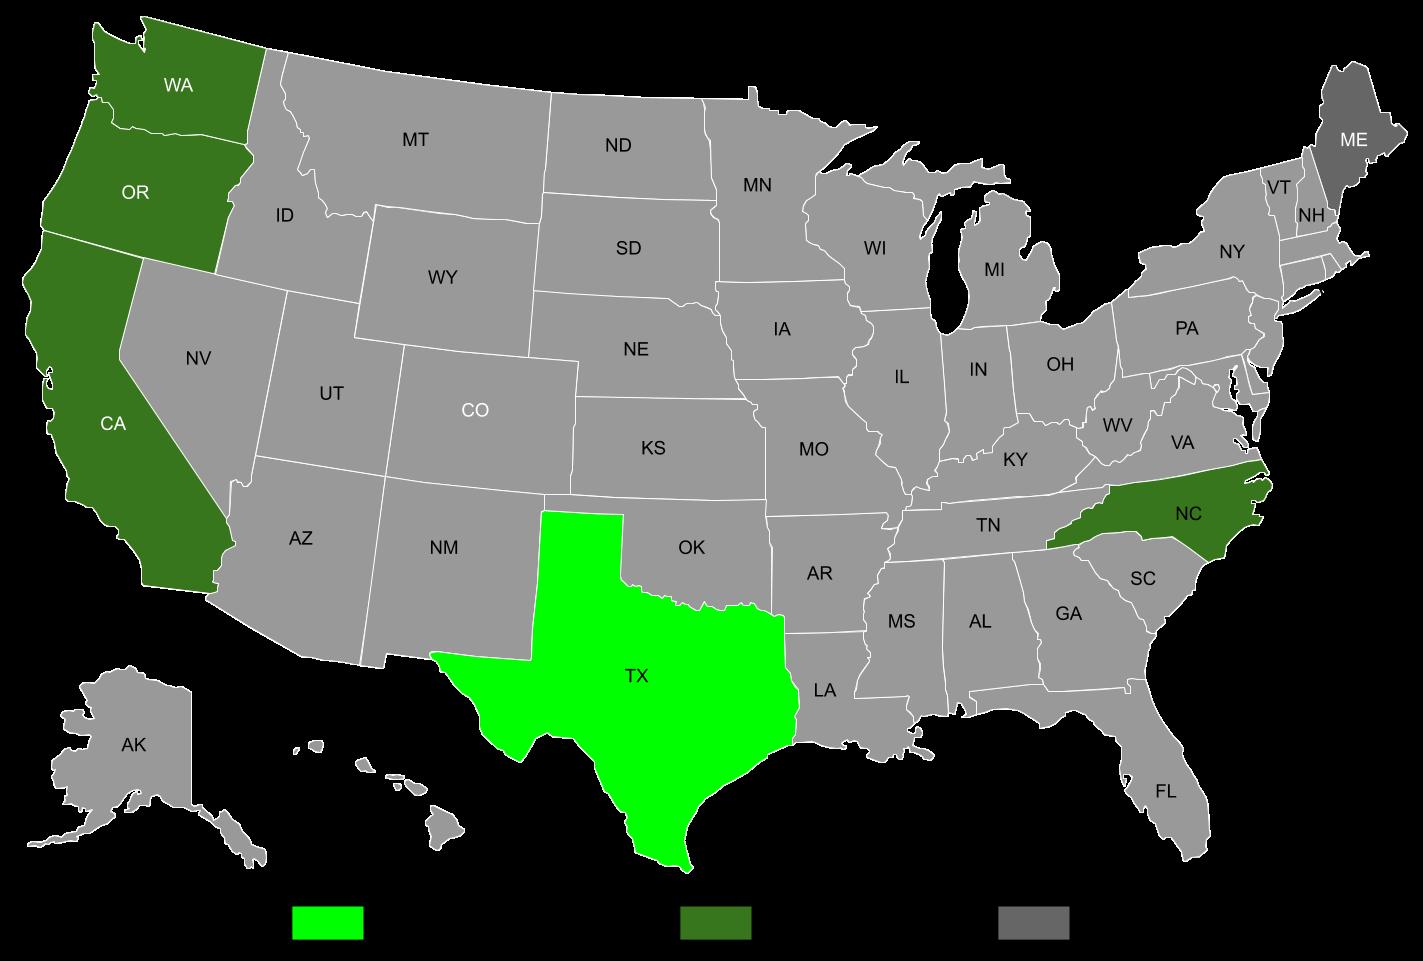 EDI Medical Implementation Map